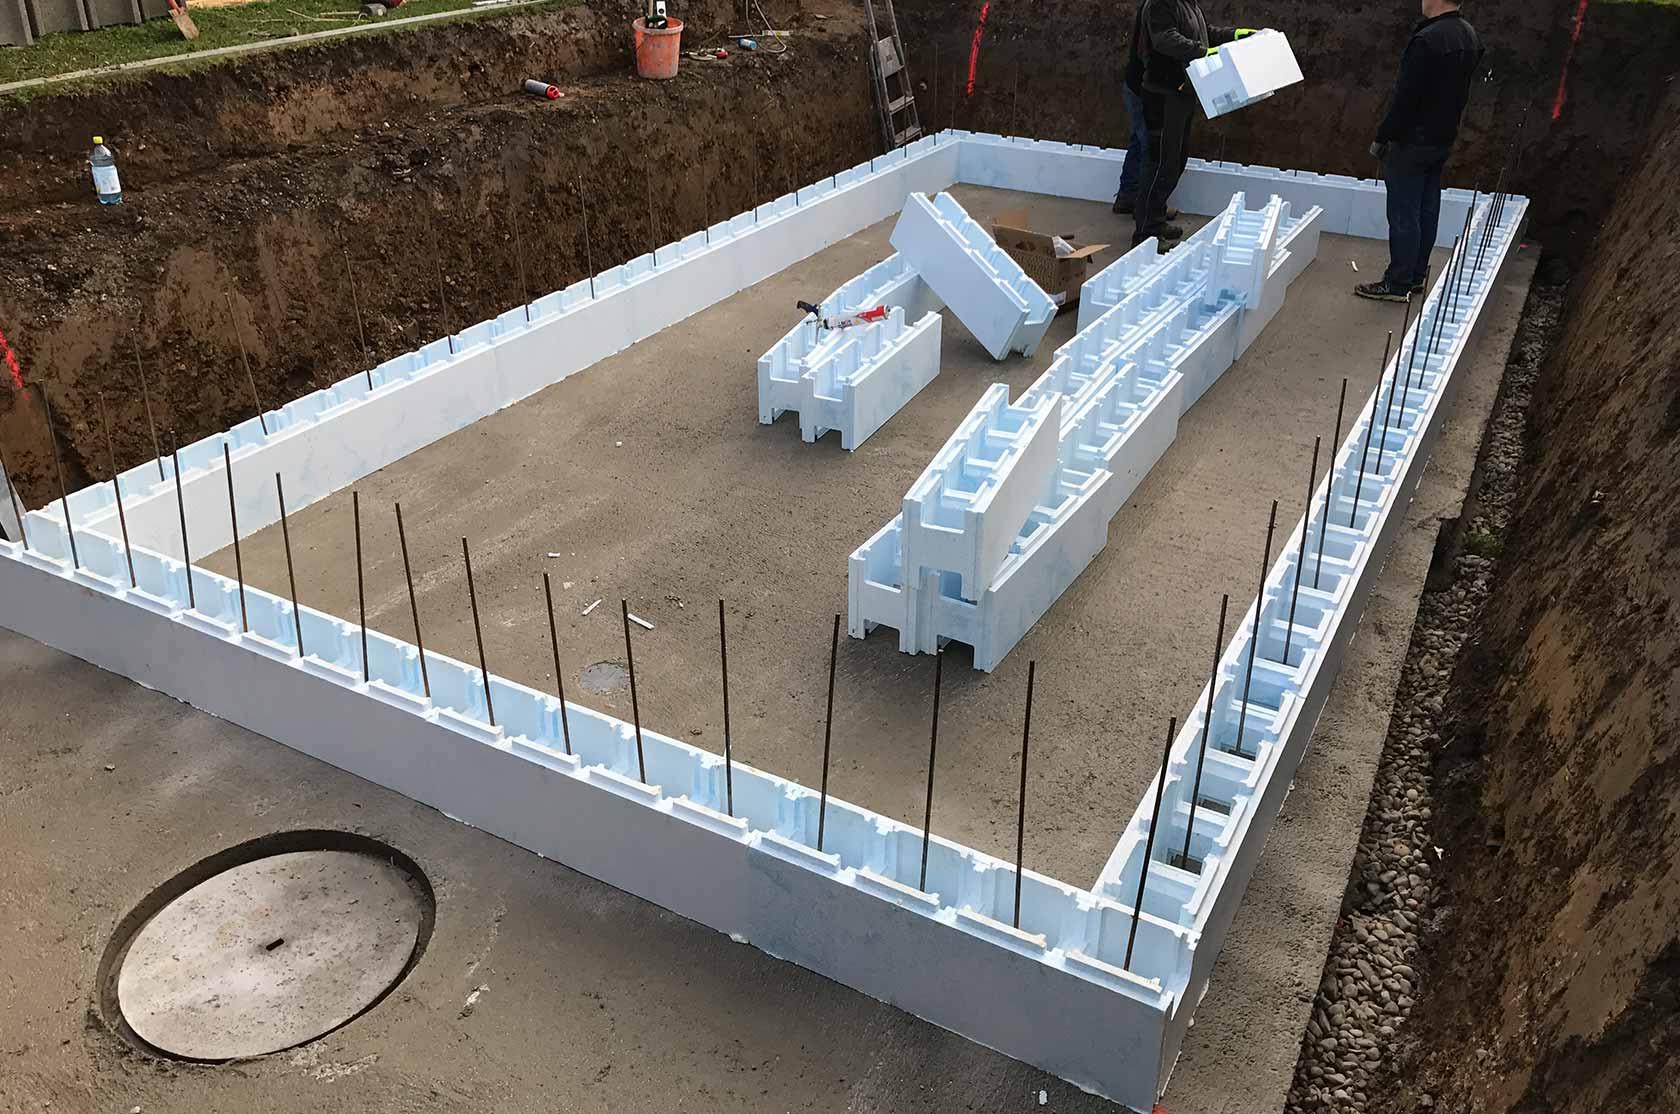 styroporpools mit treppe fertige stufenauspr gung im. Black Bedroom Furniture Sets. Home Design Ideas